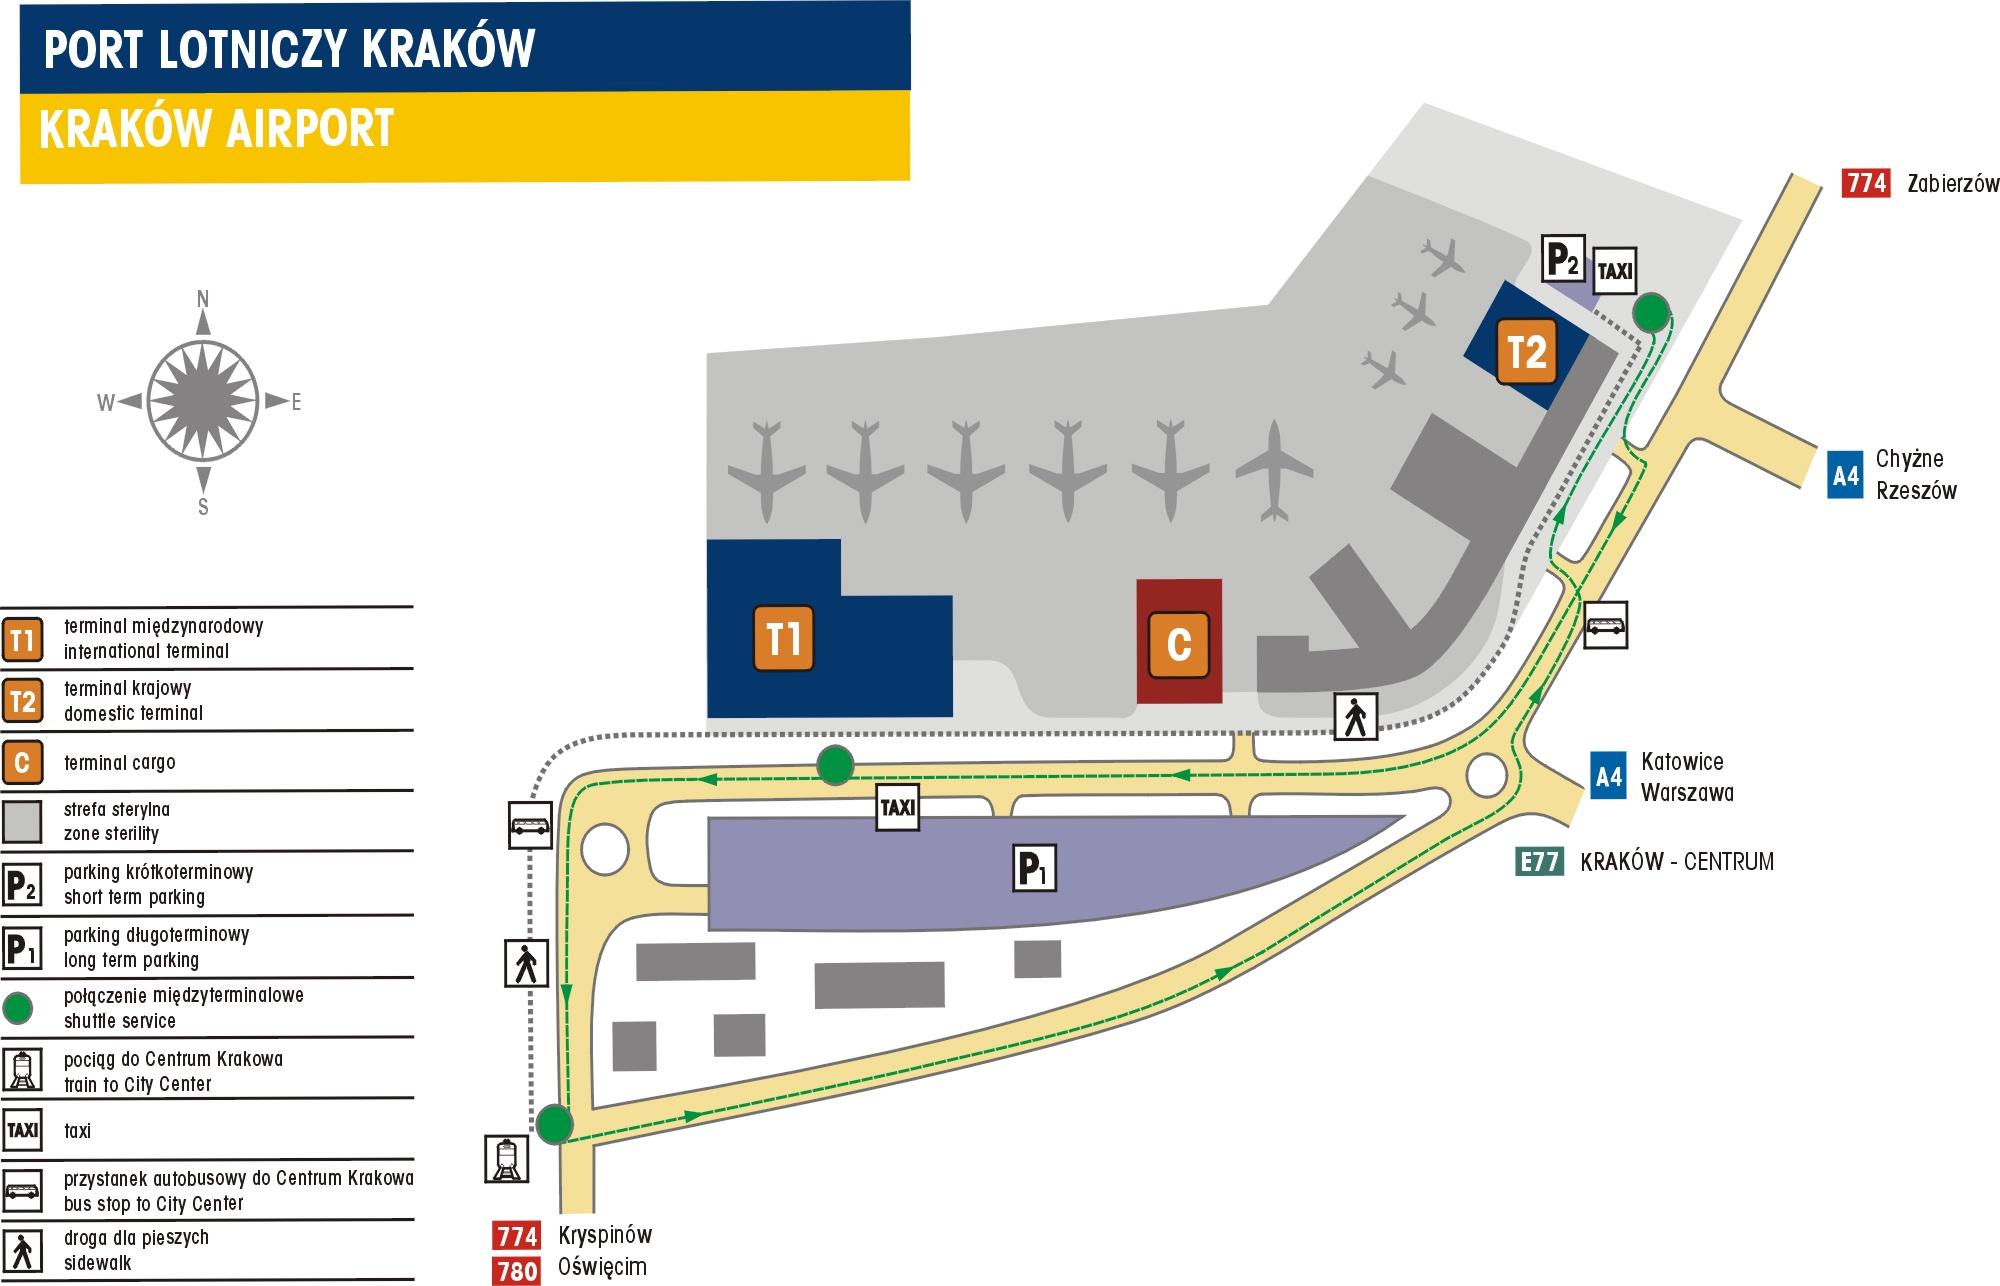 Krakow Airport Terminal Map Transportation | His Master's Voice 4th Annual Symposium   Utopias